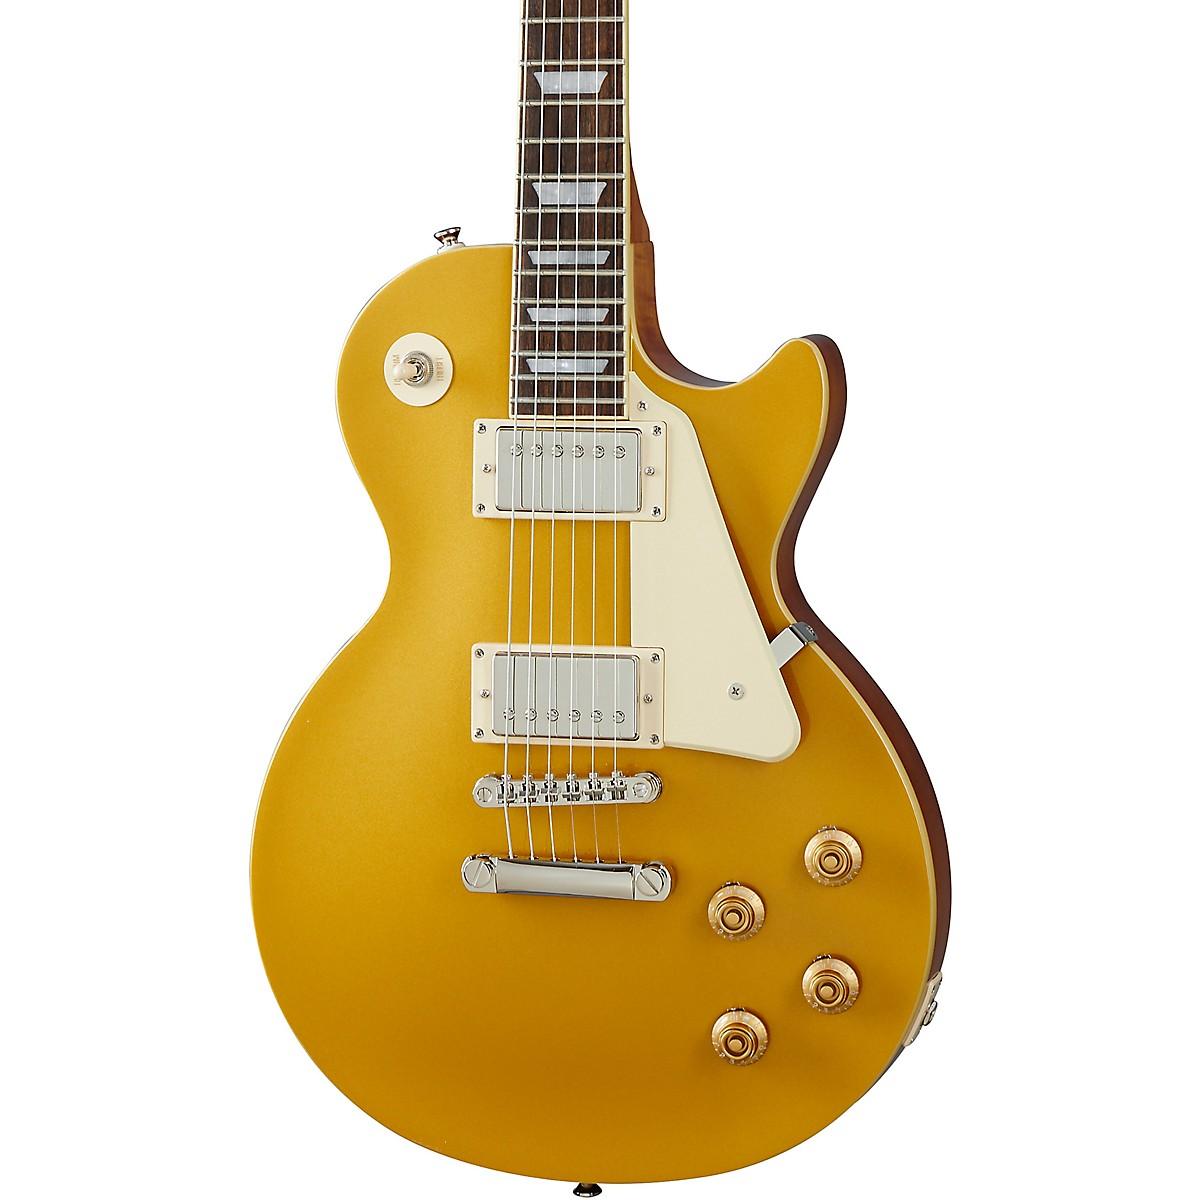 Epiphone Les Paul Standard '50s Electric Guitar